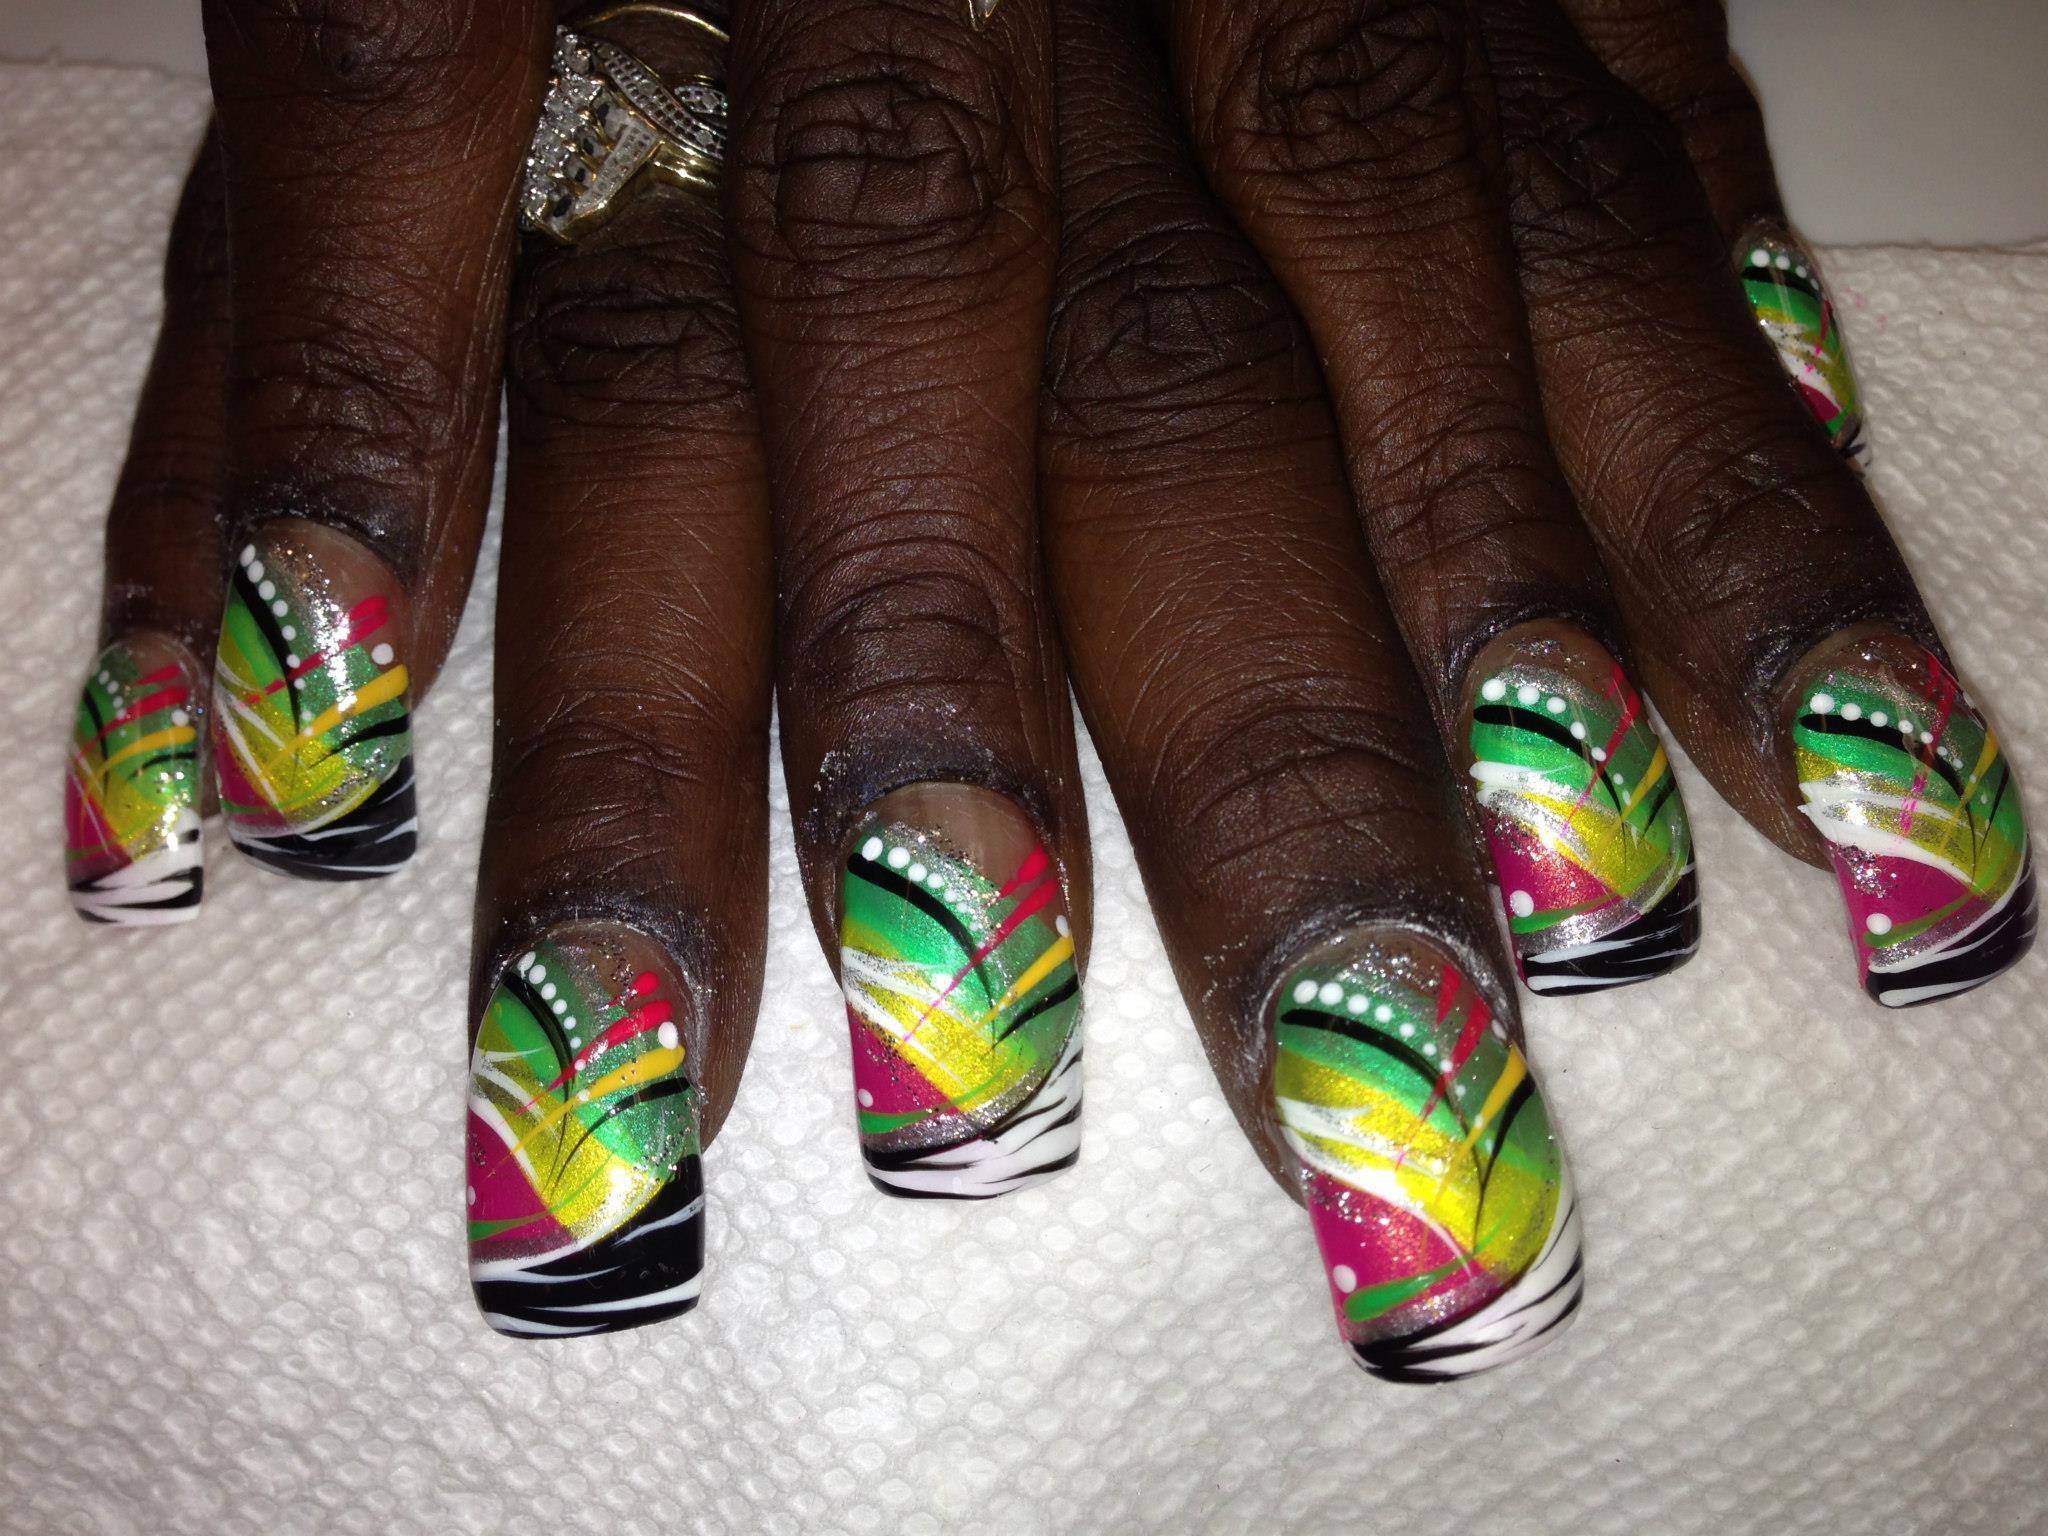 Haitian Celebration, nail art designs by Top Nails, Clarksville TN ...